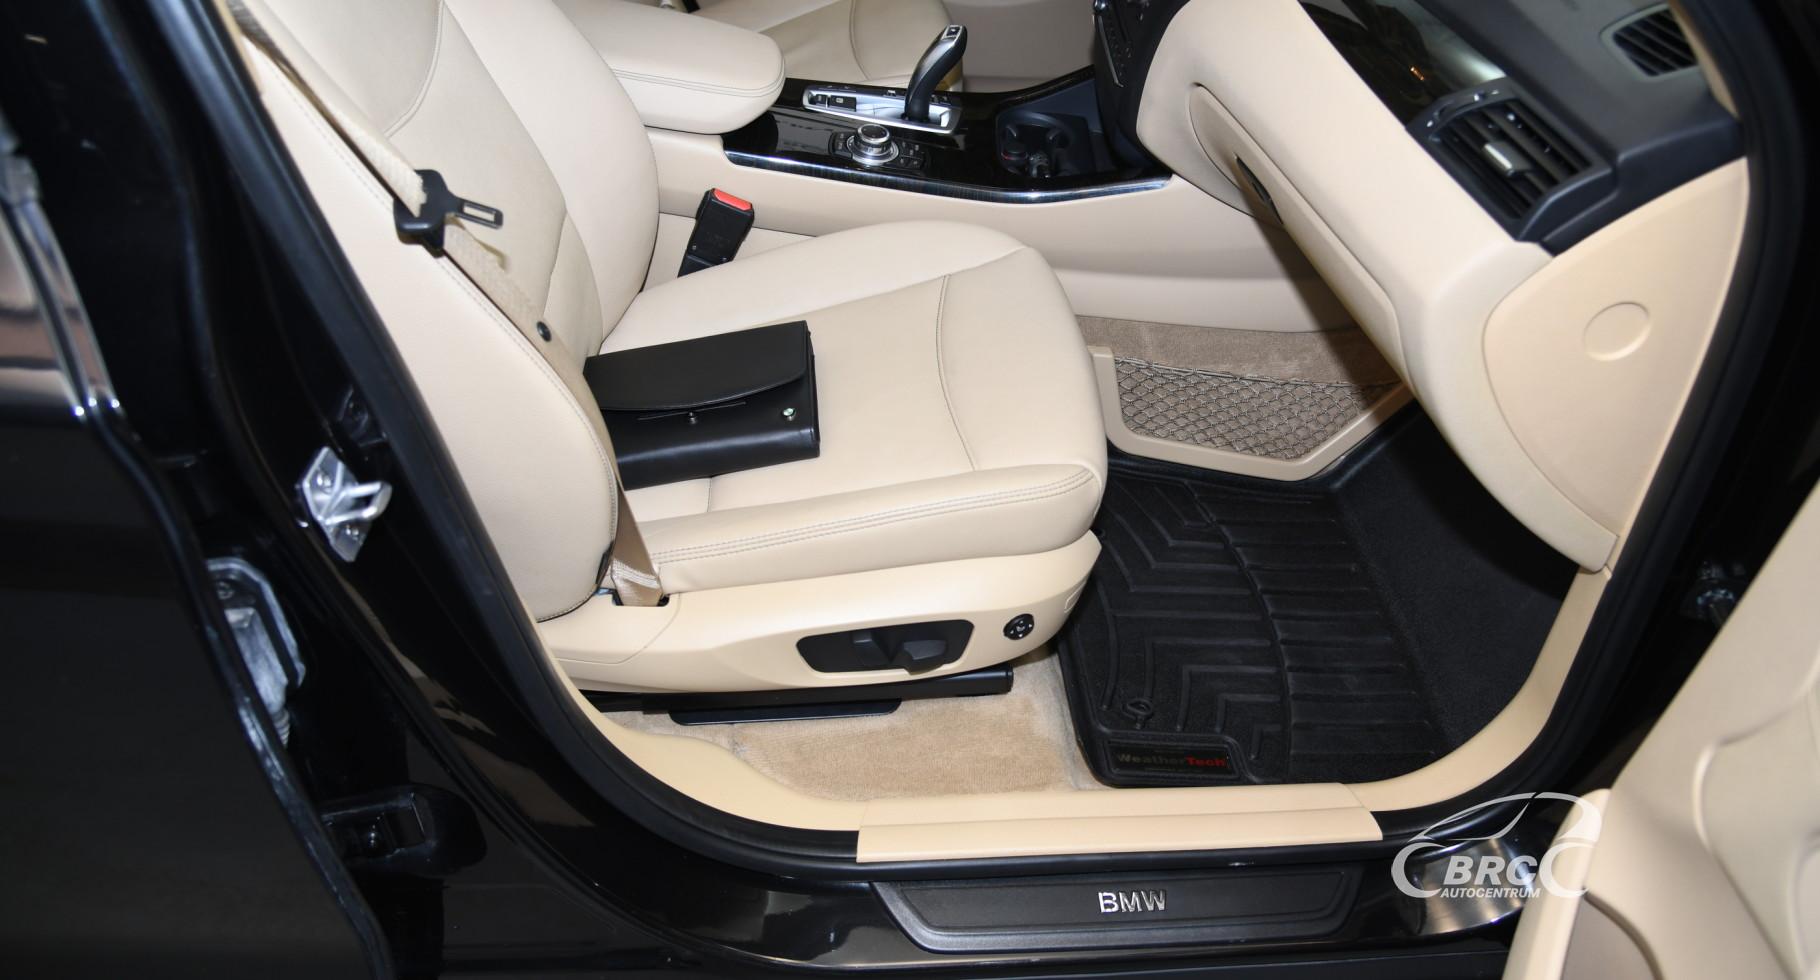 BMW X3 xDrive 35i Automatas